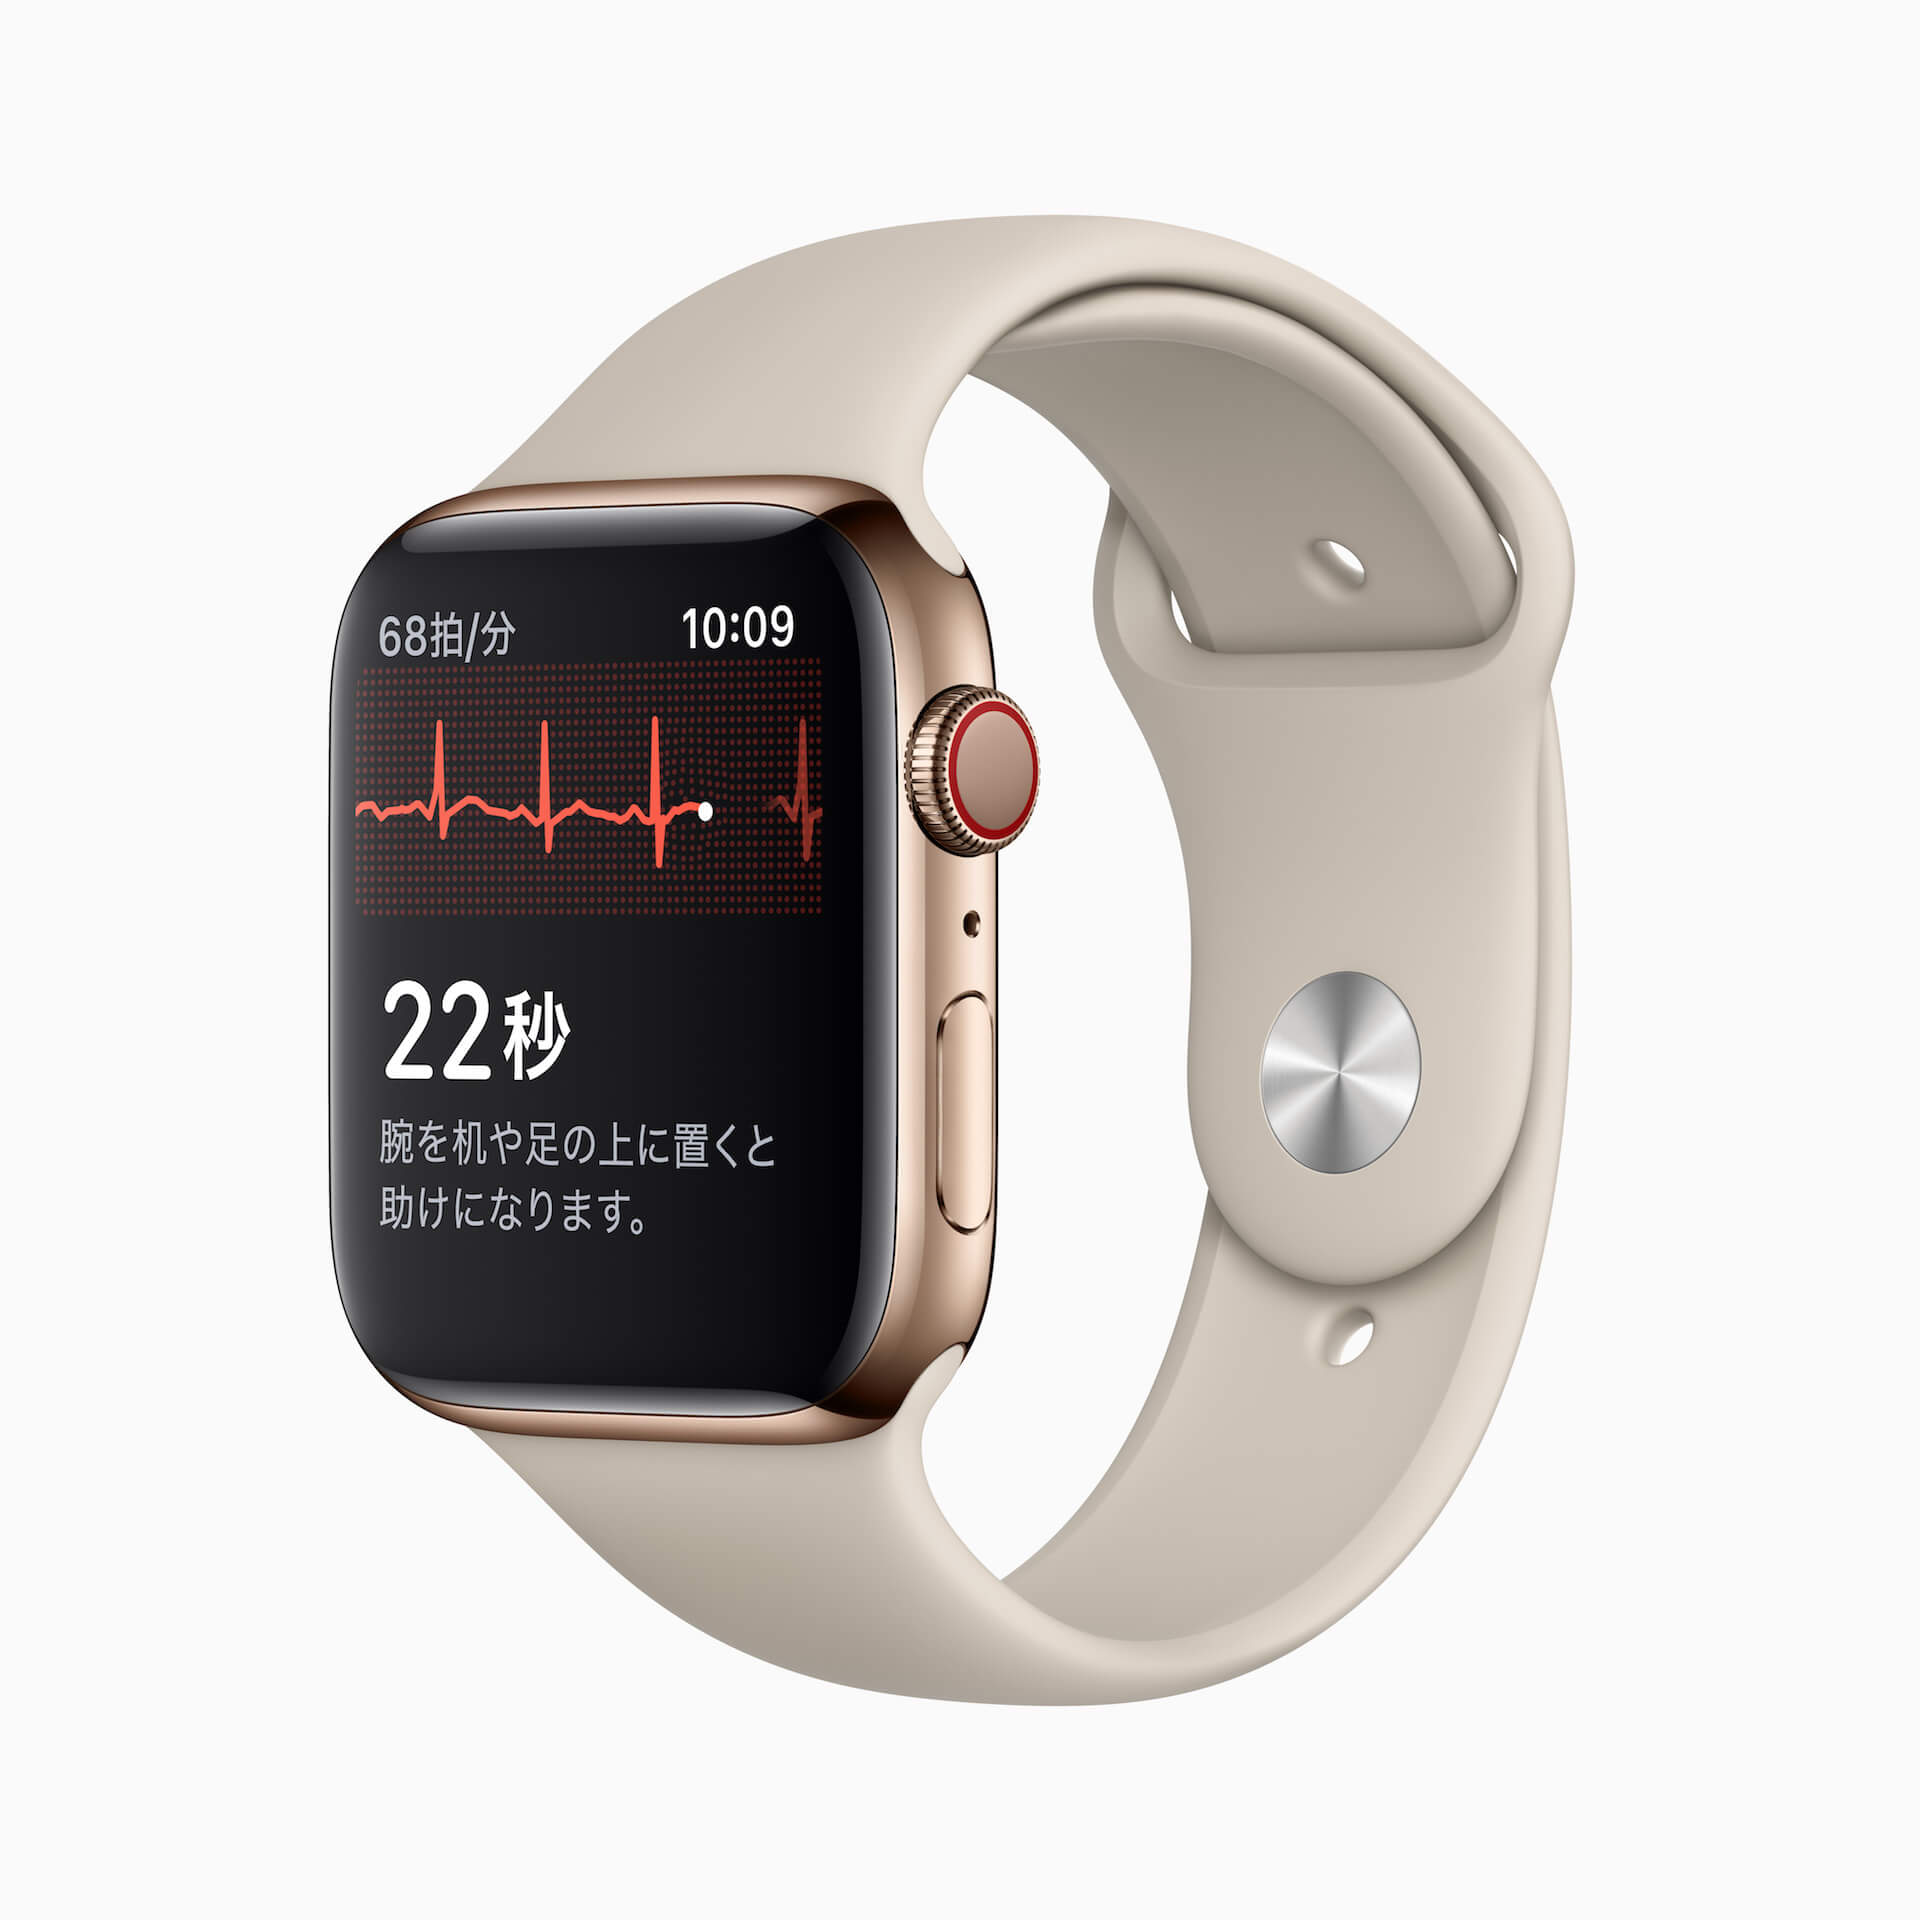 Apple Watchの心電図アプリケーションがついに日本で解禁へ!心拍リズムを計測可能に tech210122_applewatch_main